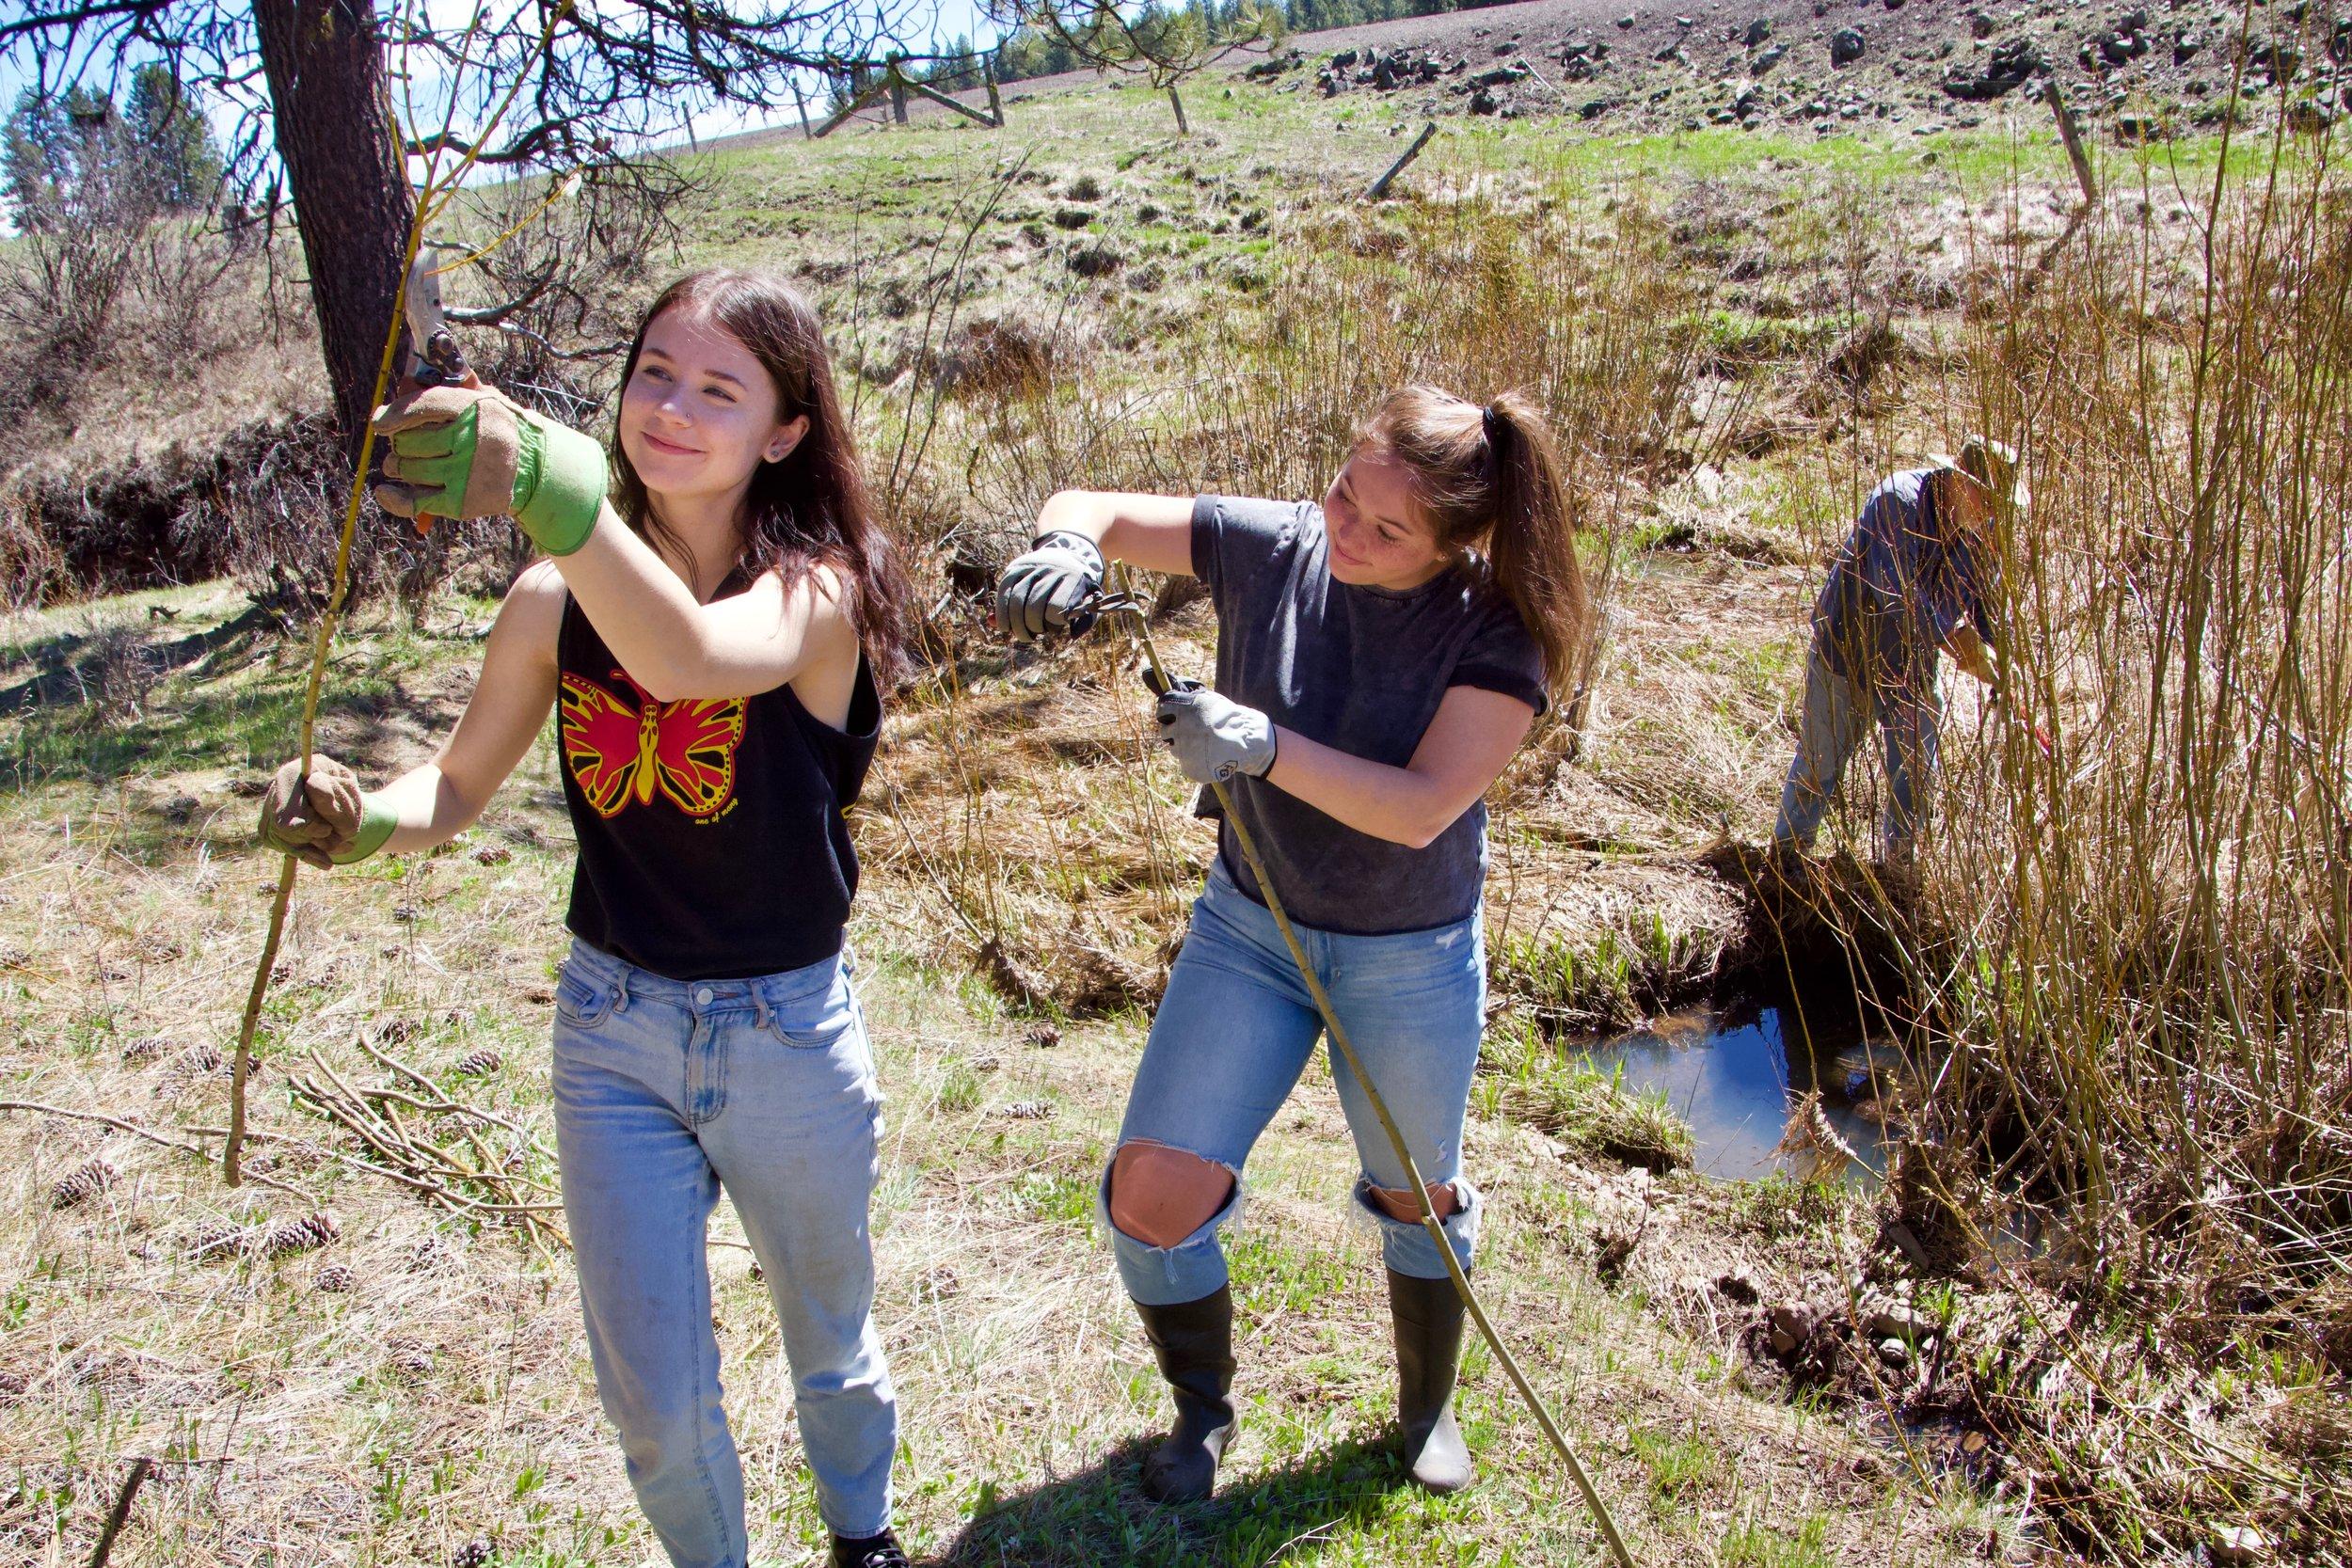 Preparing willow for planting, April 2019. Photo by Linda Thomas